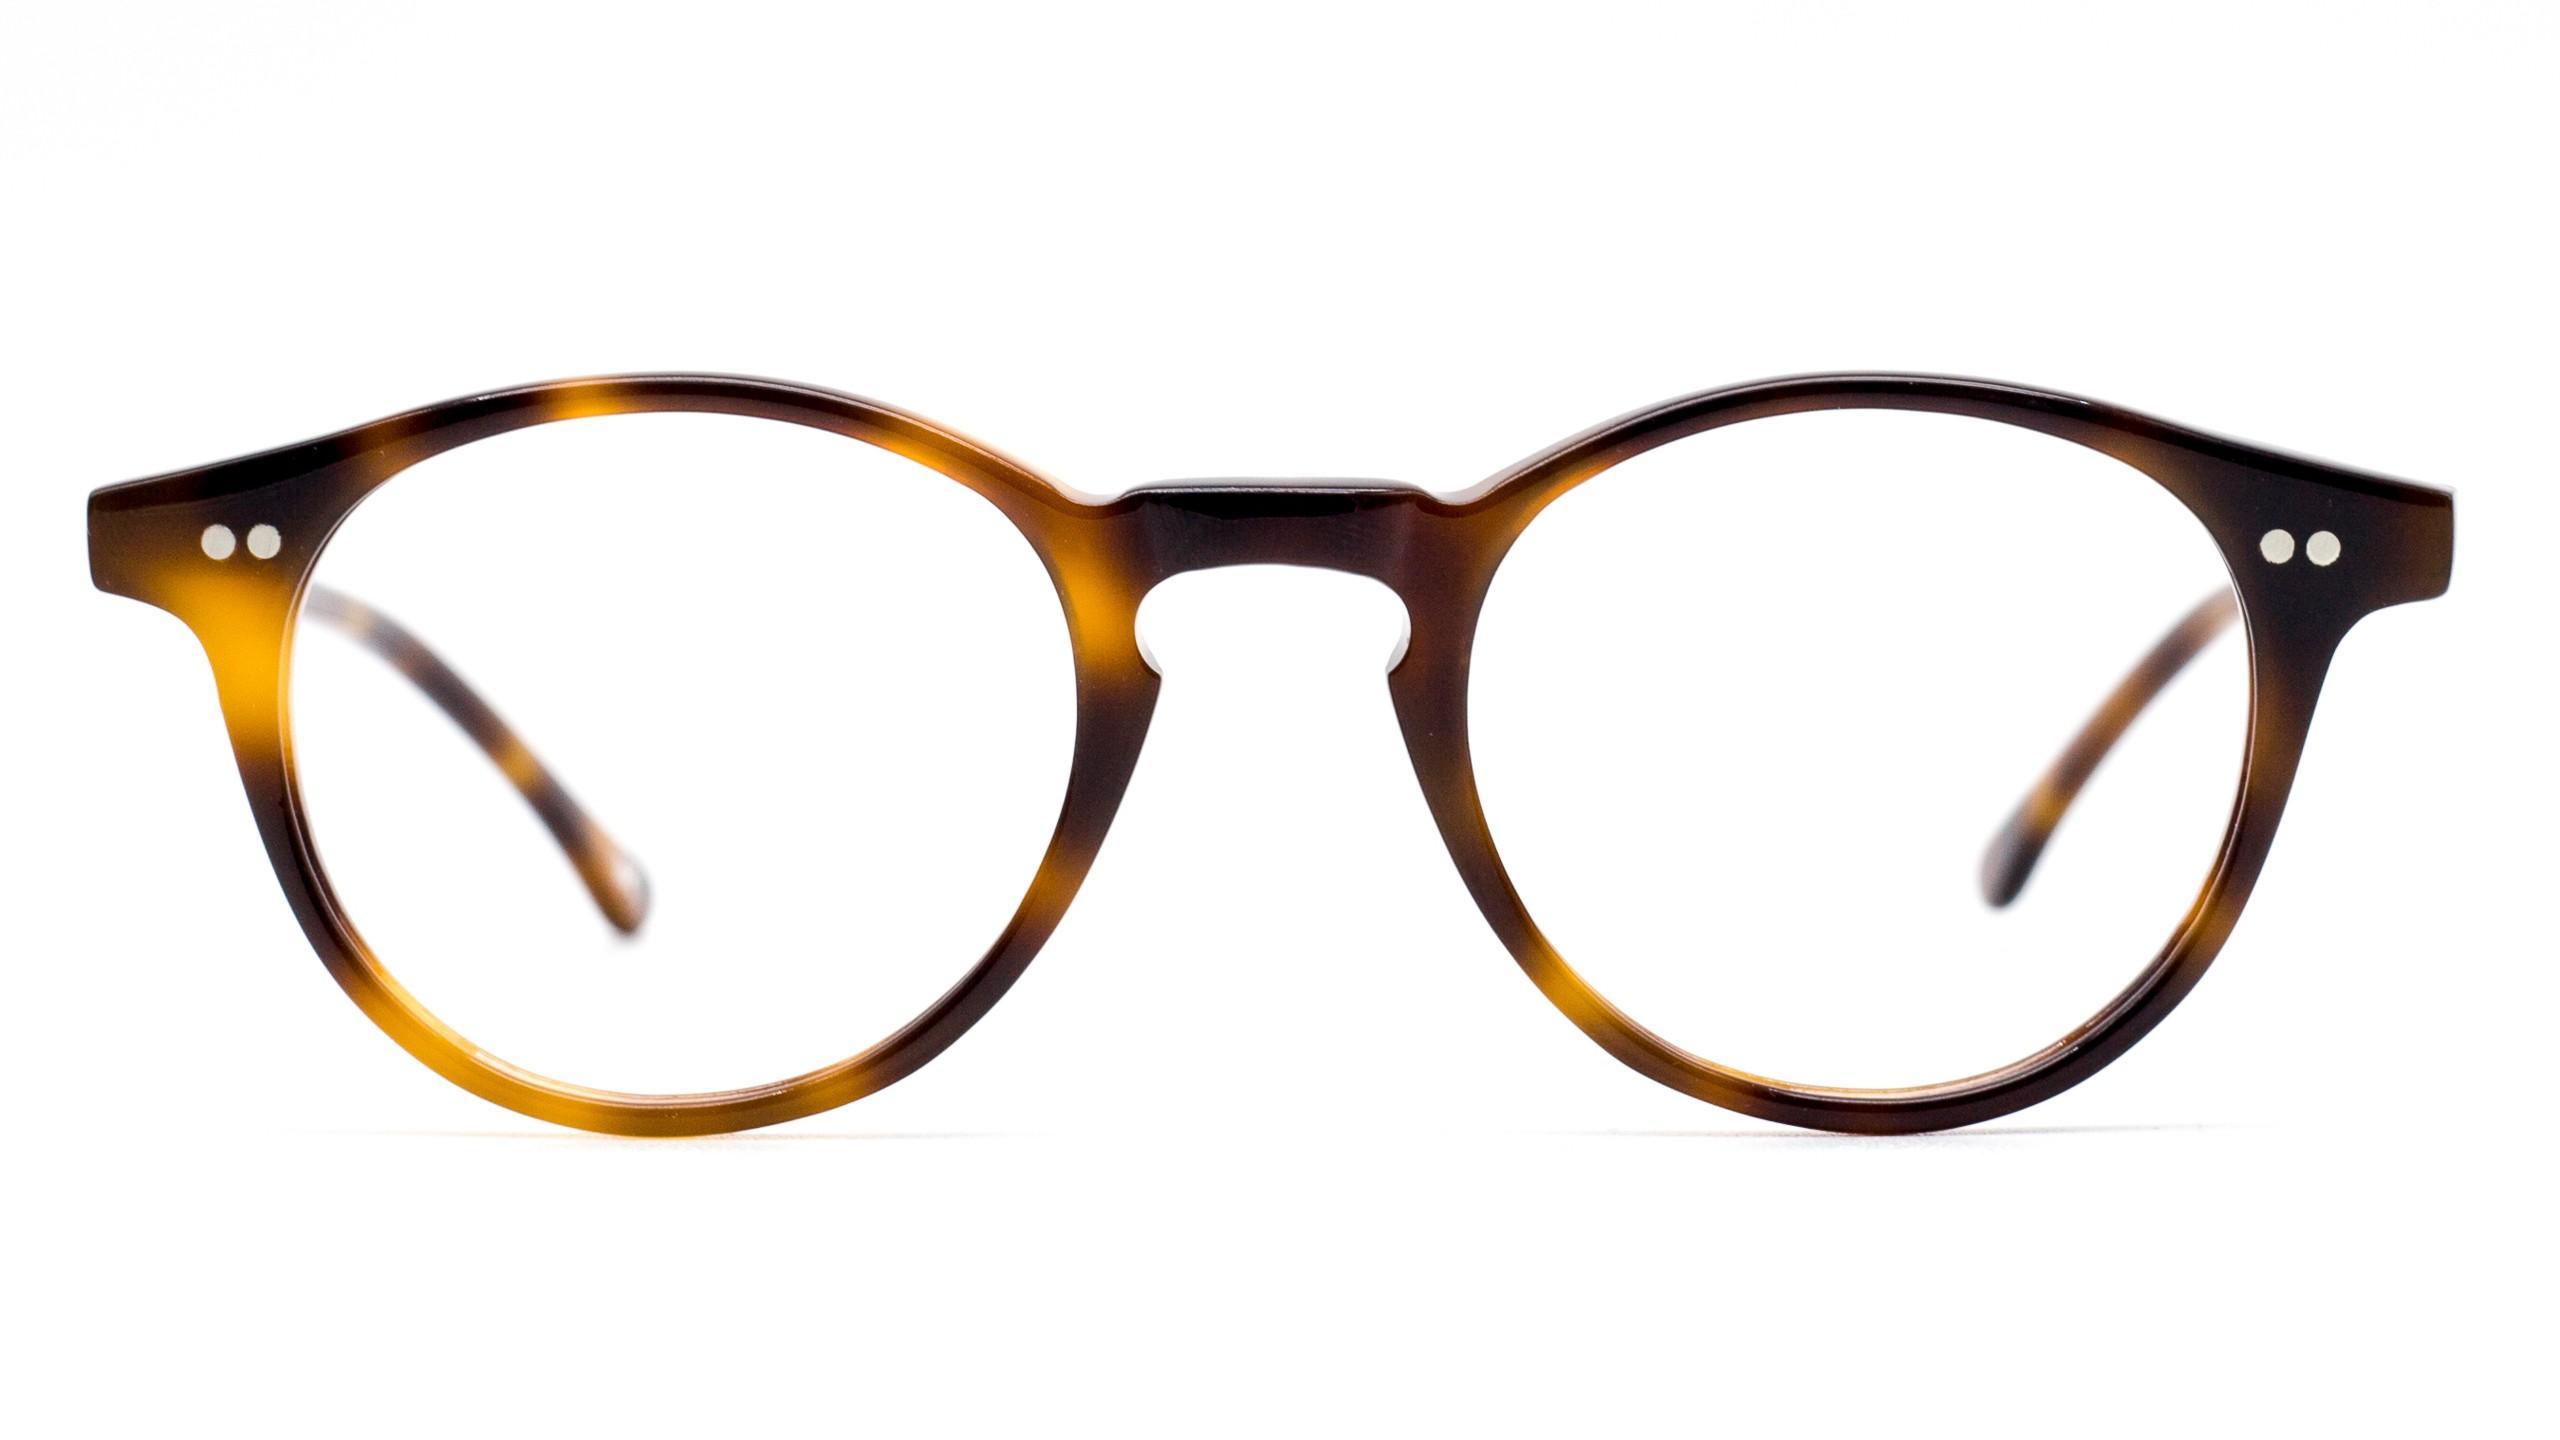 eyeglasses-Nathan-Kaltermann-made-in-Italy-Andrew-C03-Vista1